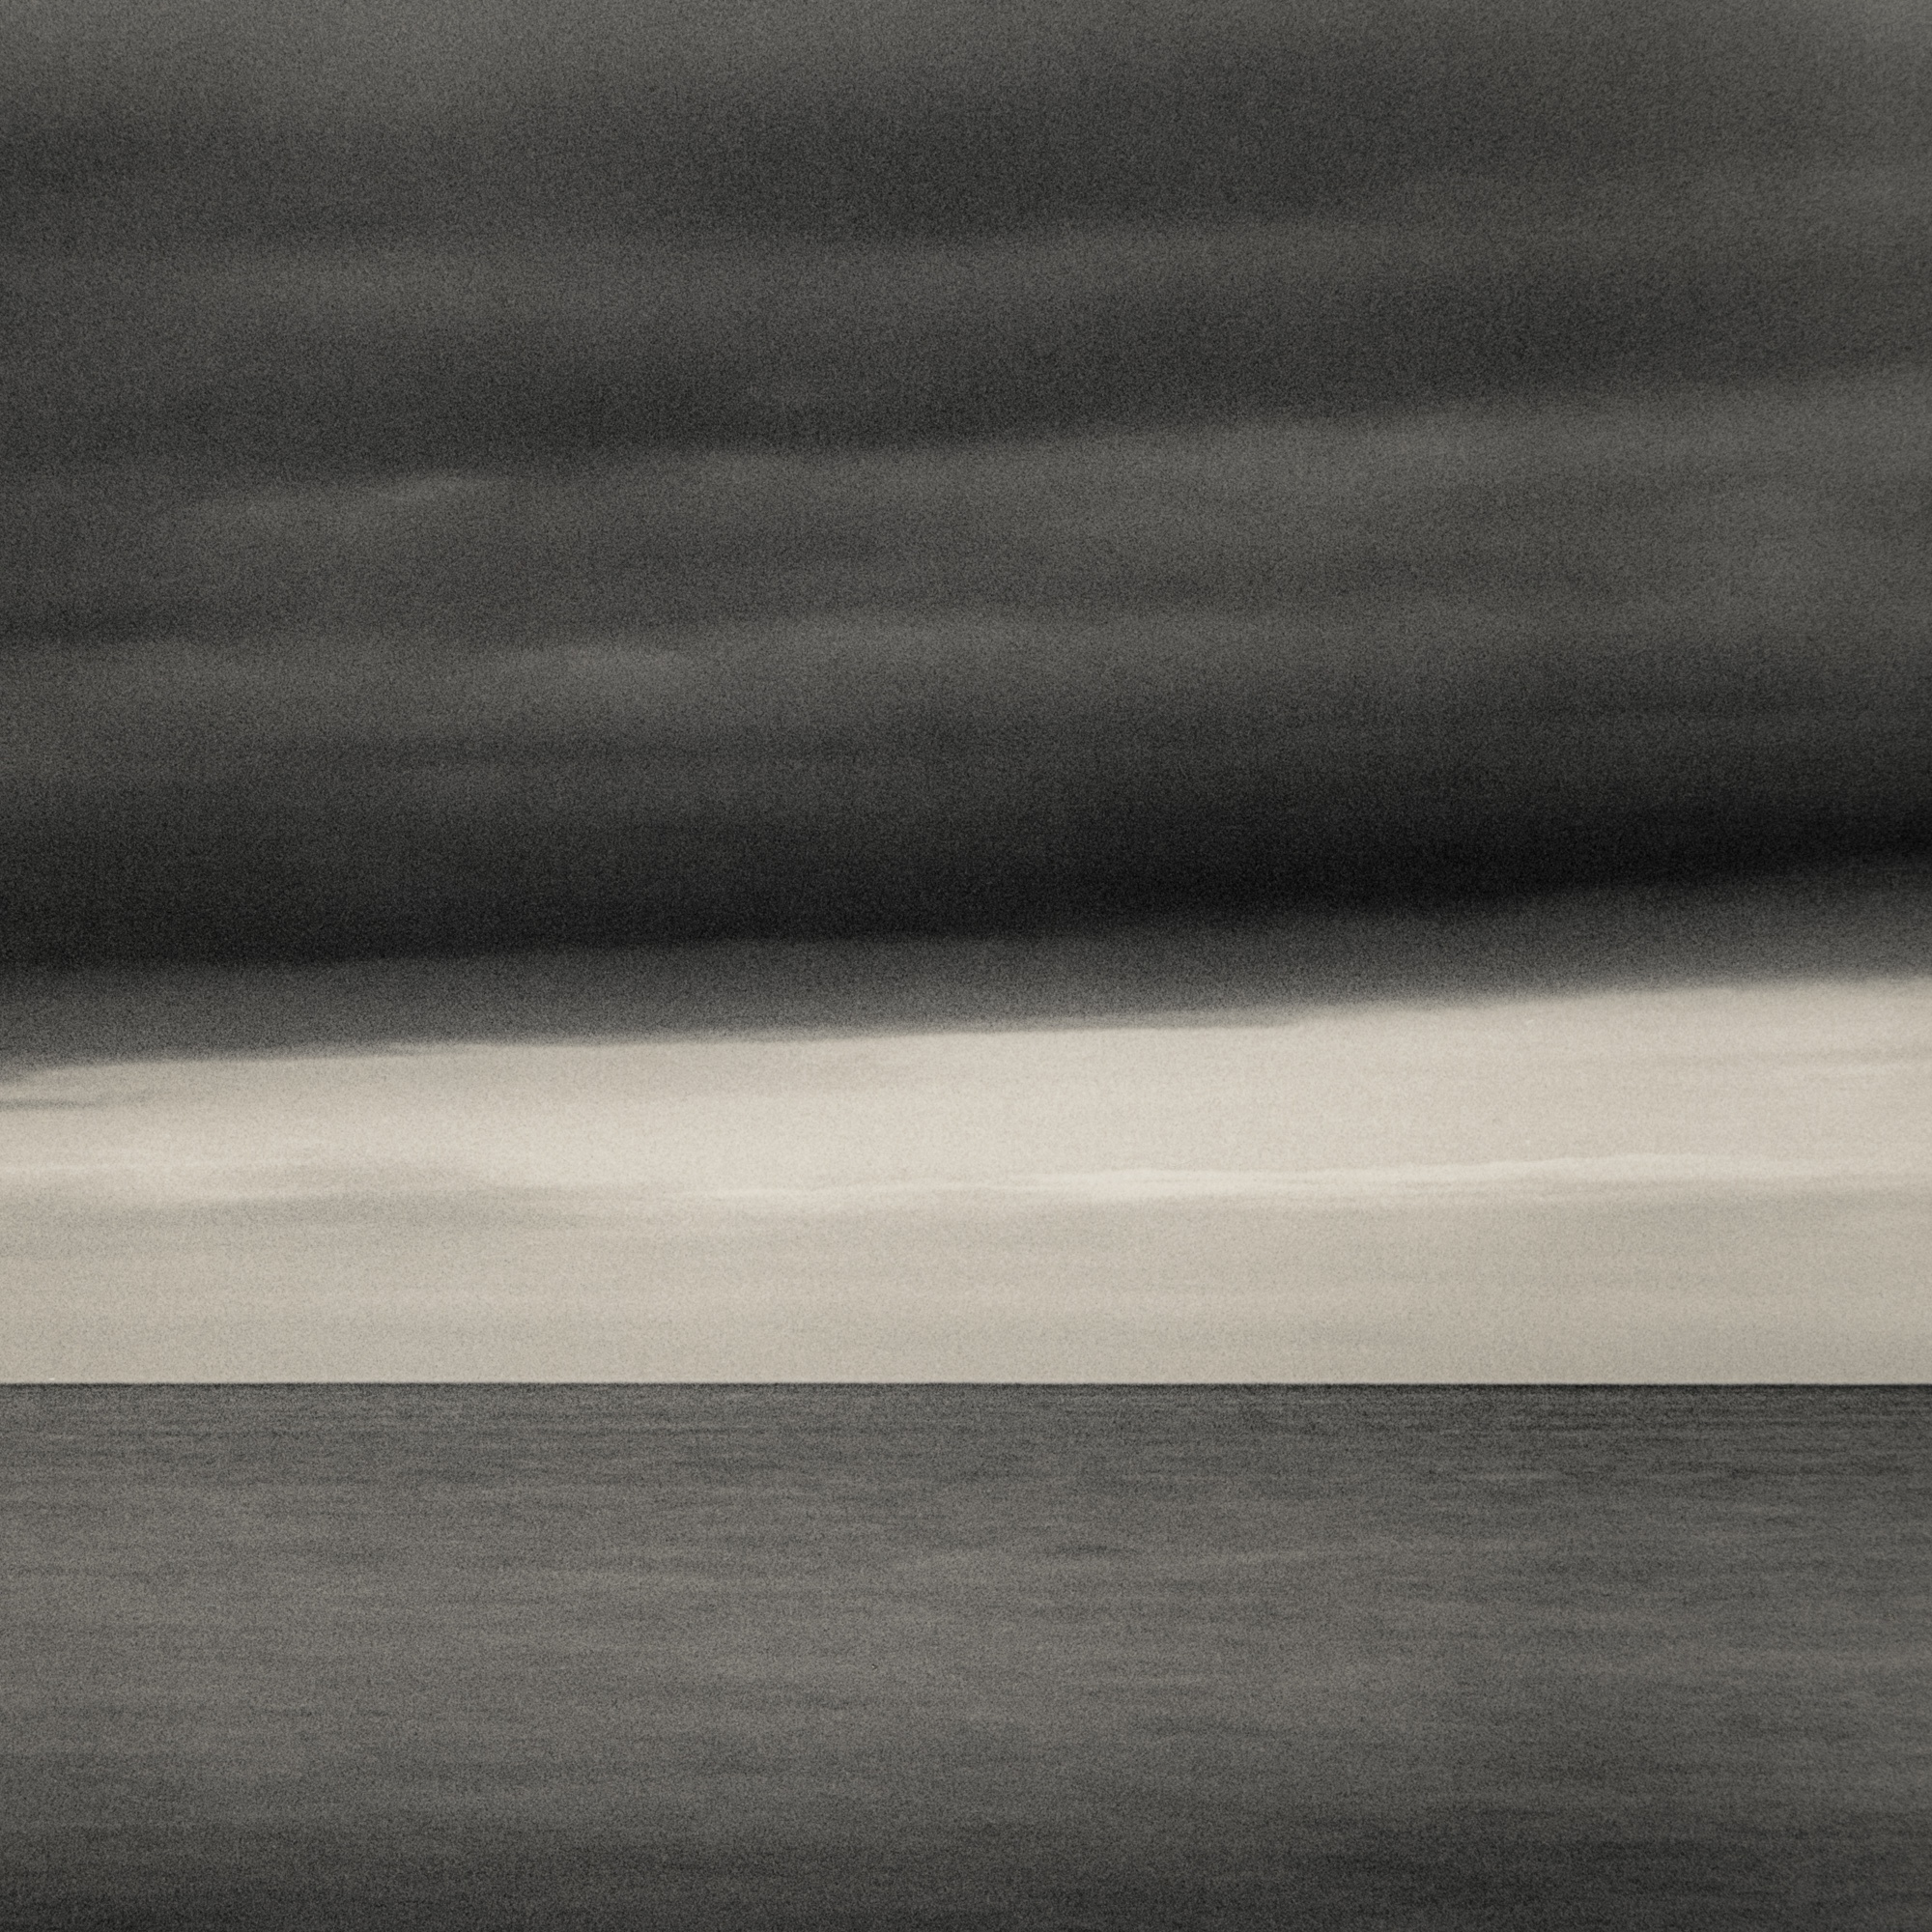 Emptiness-9